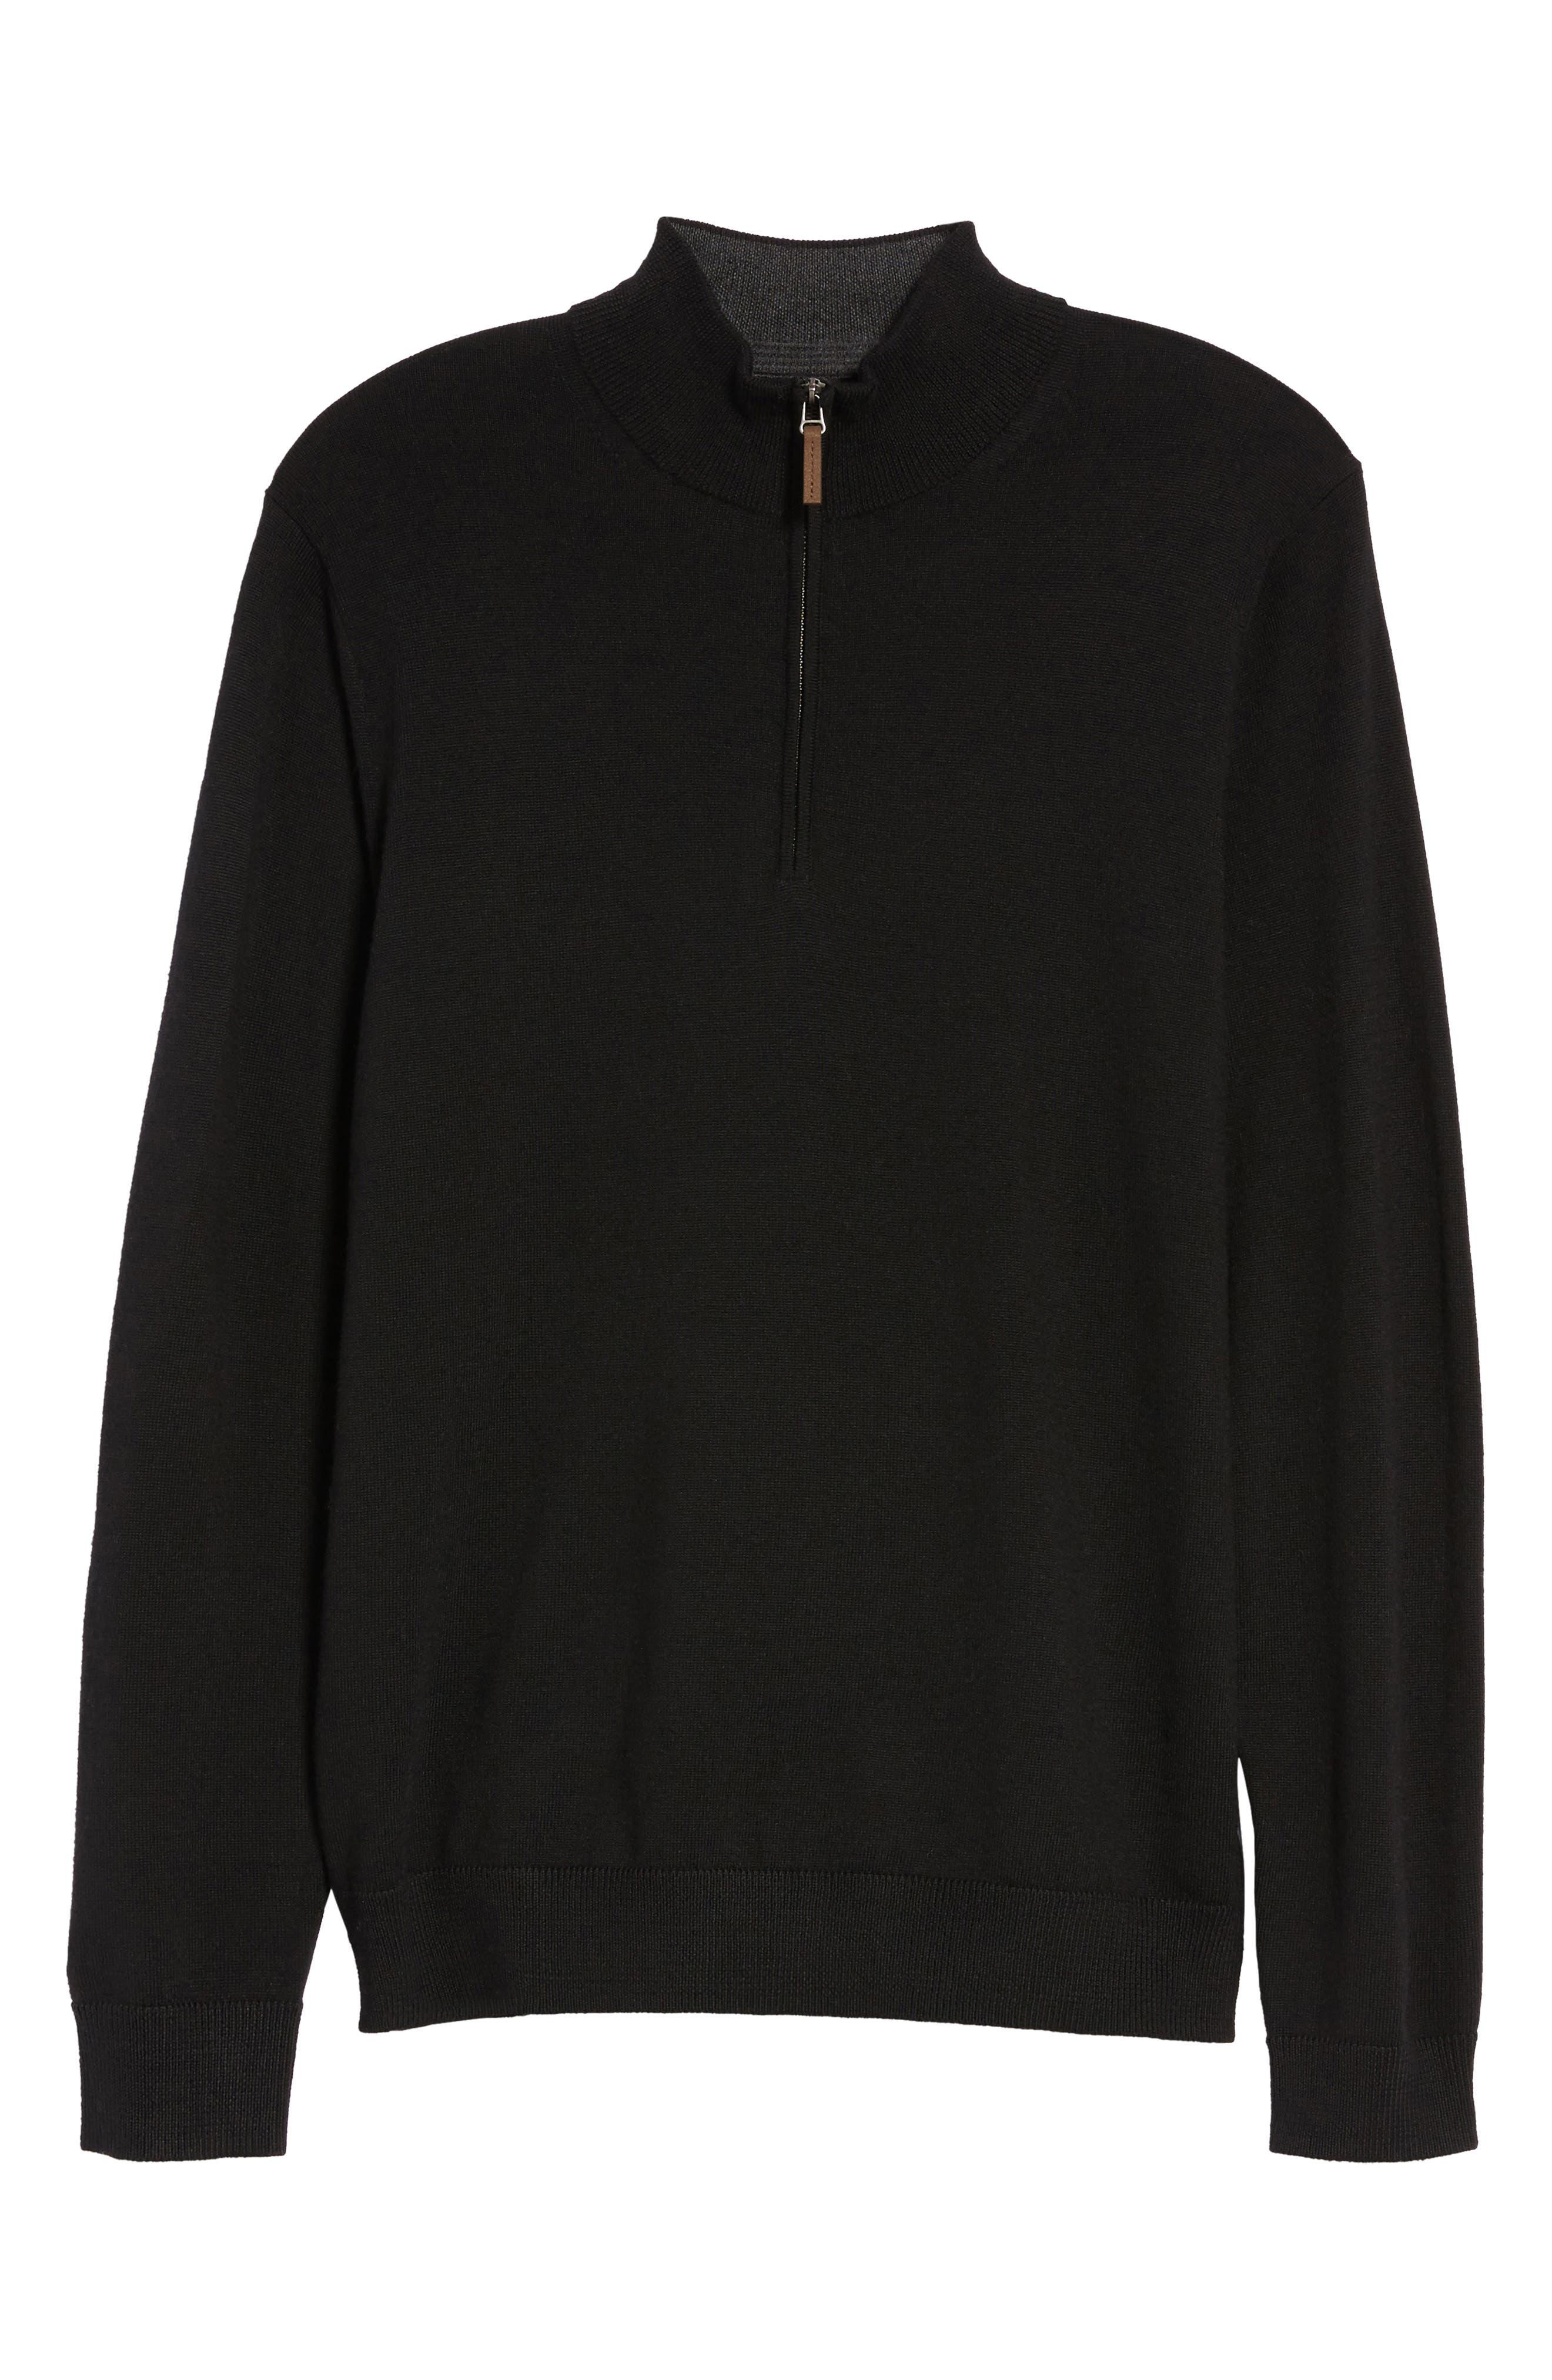 Quarter Zip Wool Pullover,                             Alternate thumbnail 6, color,                             Black Caviar